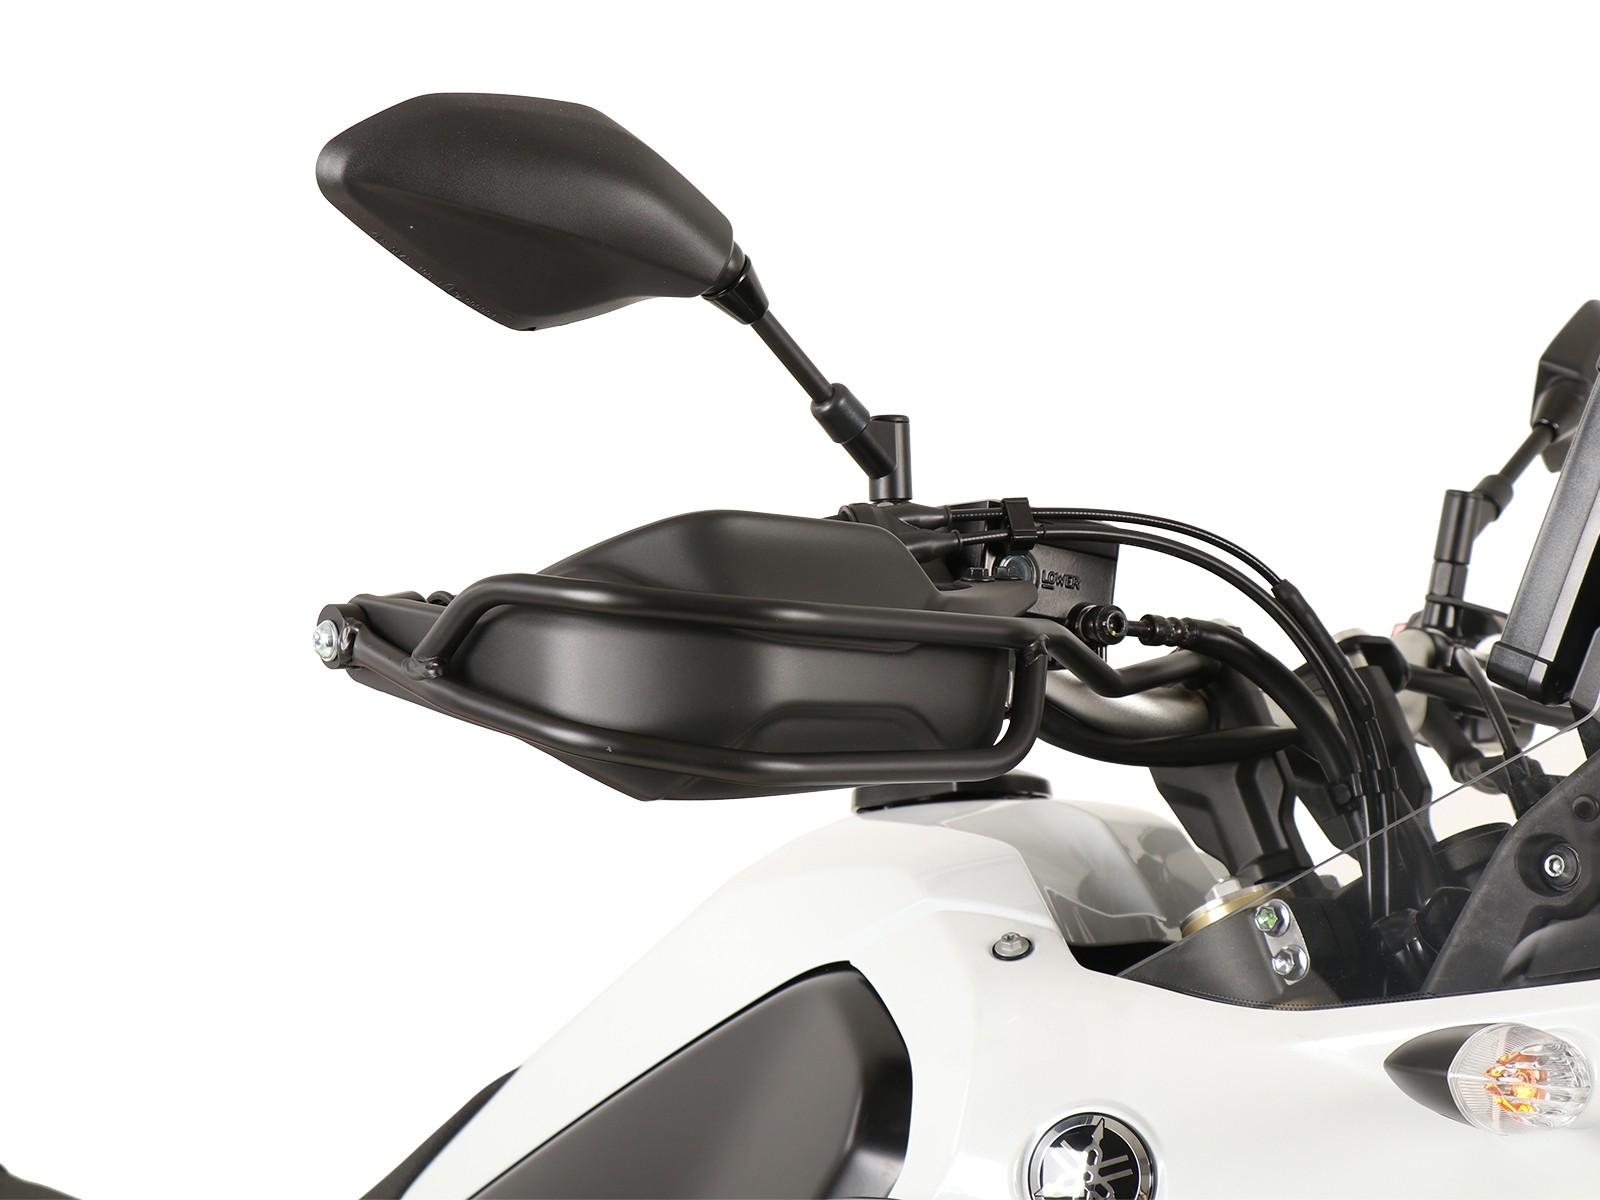 Hepco & Becker Handguard Kit Yamaha XT 700 Z Tenere 2019 -